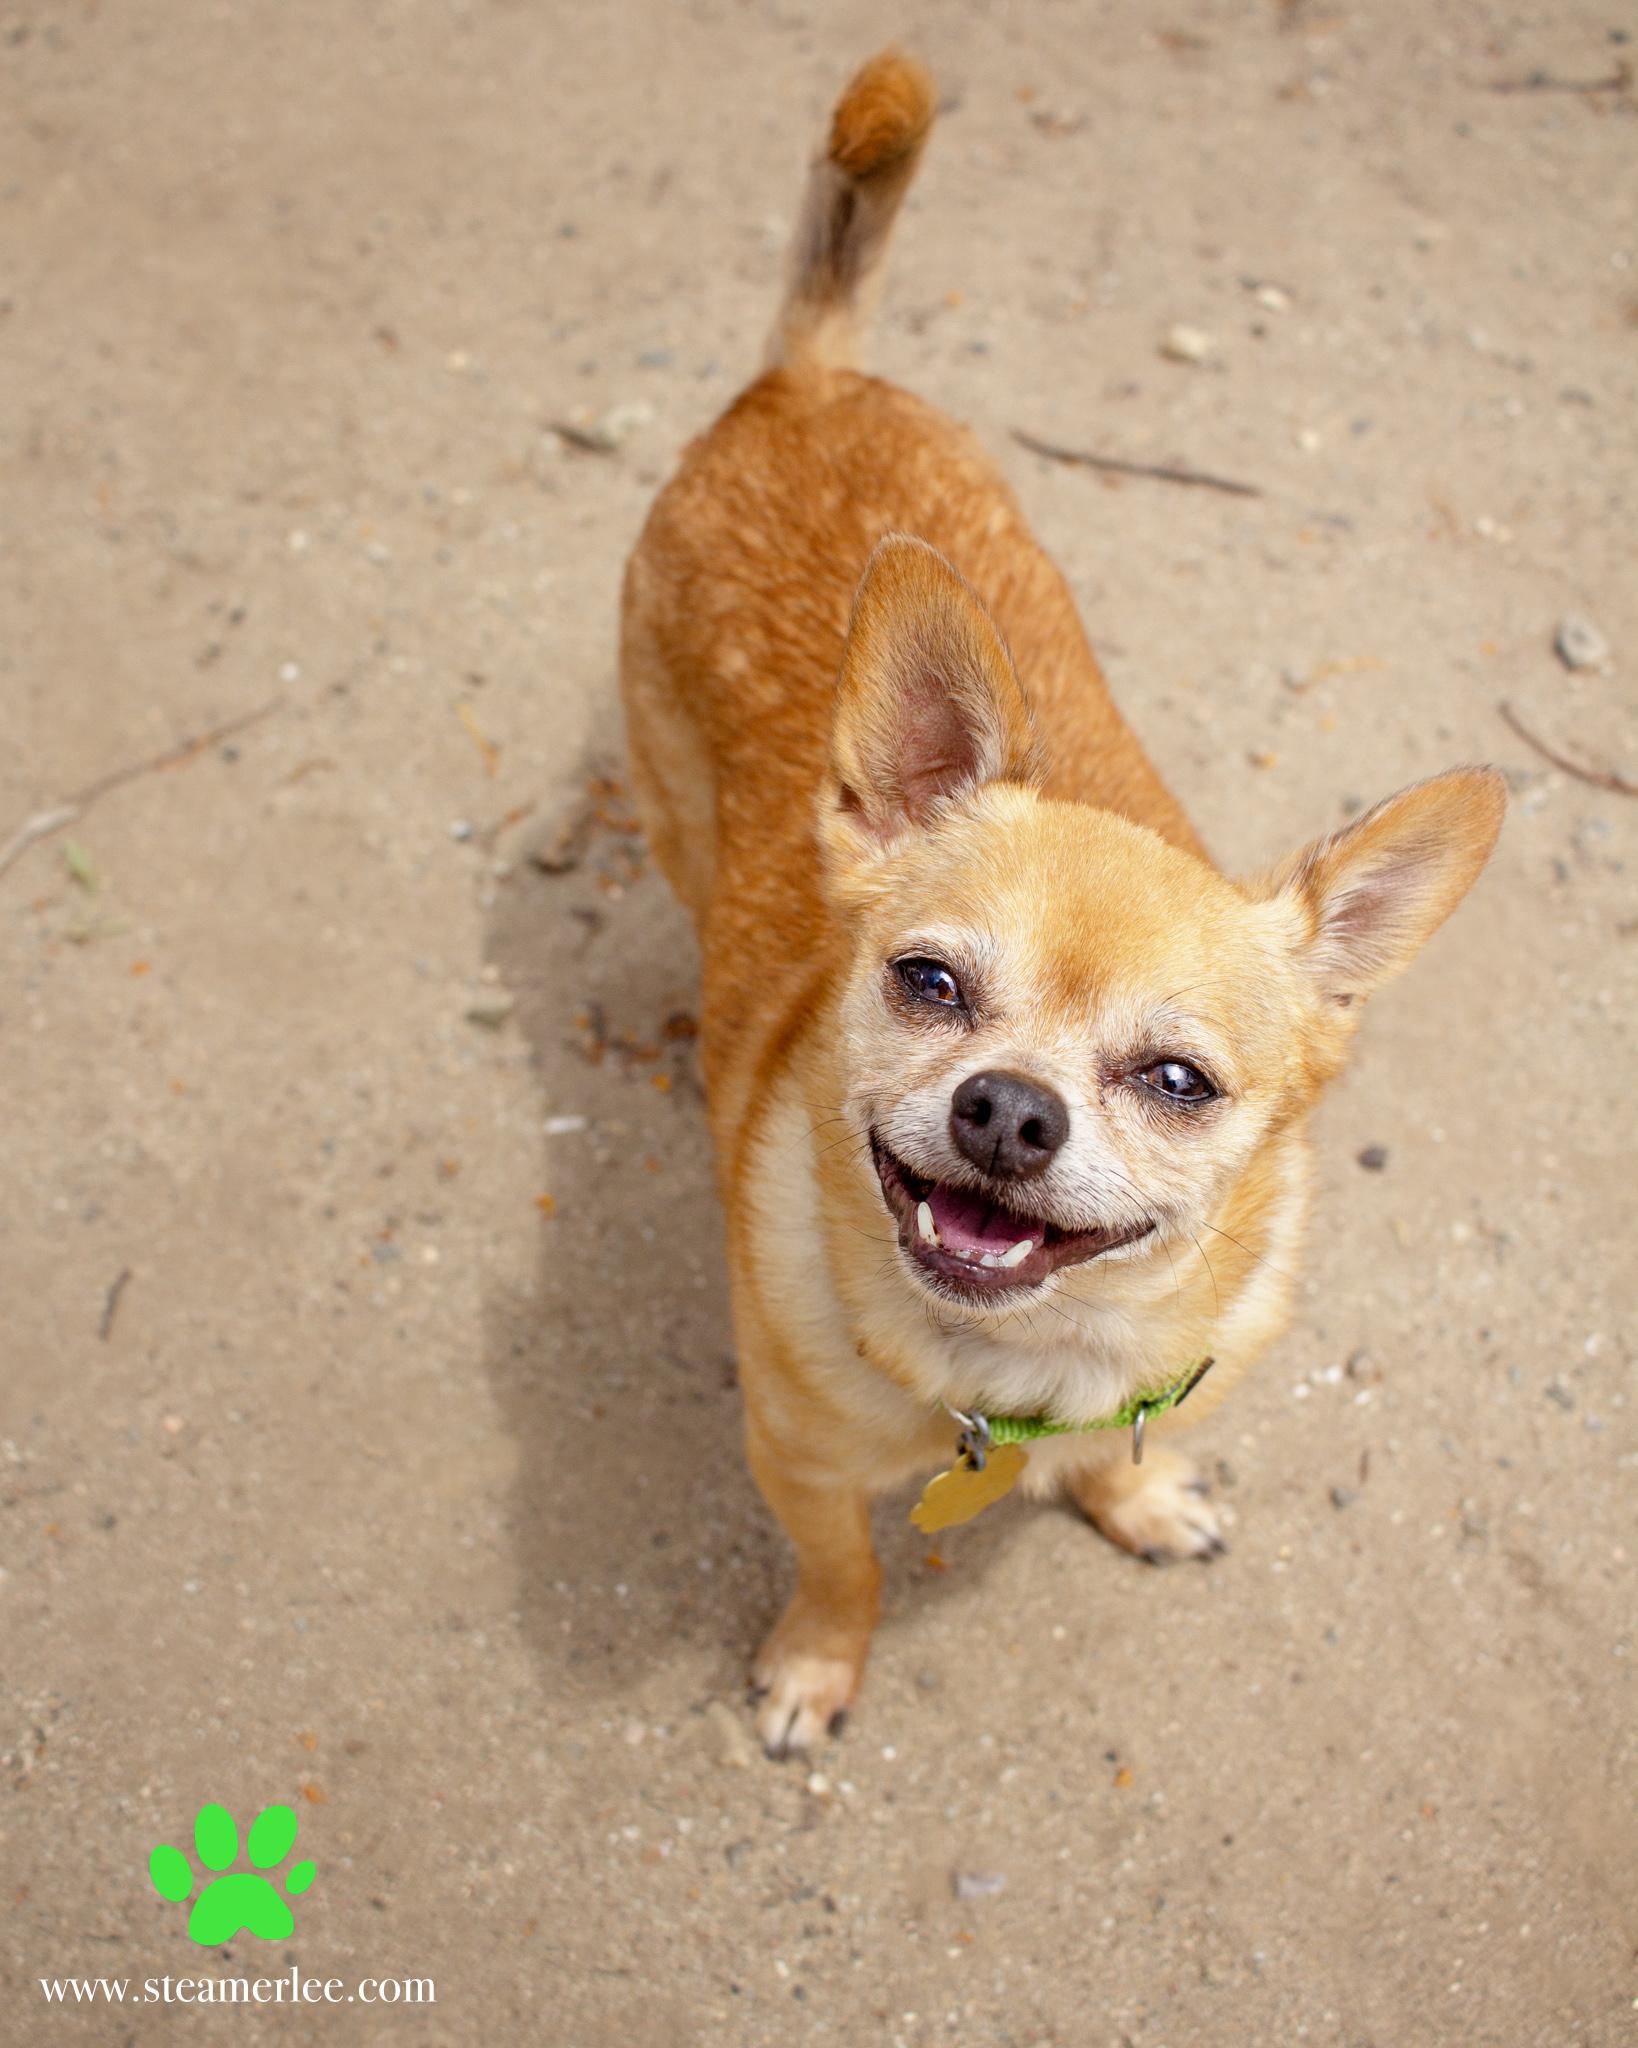 372-Orange-County-Dog-Photography-Steamer-Lee-Southern-California-SBACC.JPG